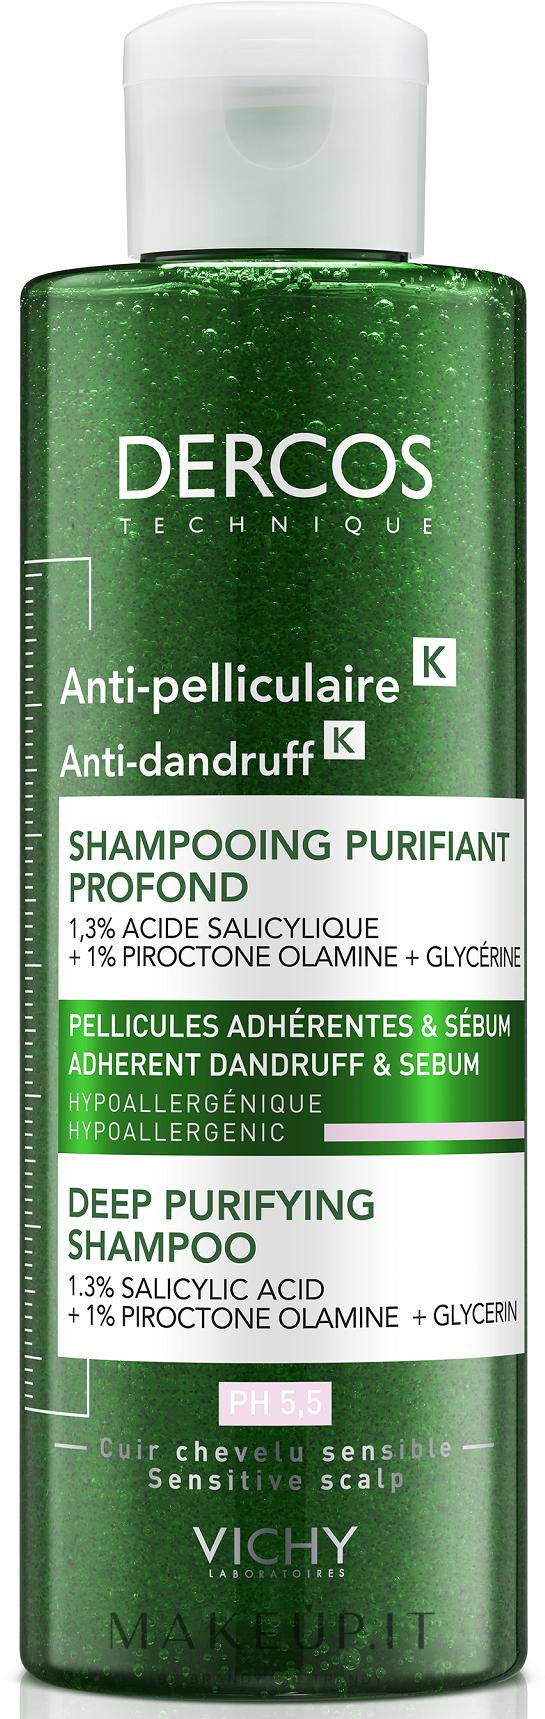 Shampoo anti forfora - Vichy Dercos Micro Peel Anti-Dandruff Scrub Shampoo — foto 250 ml